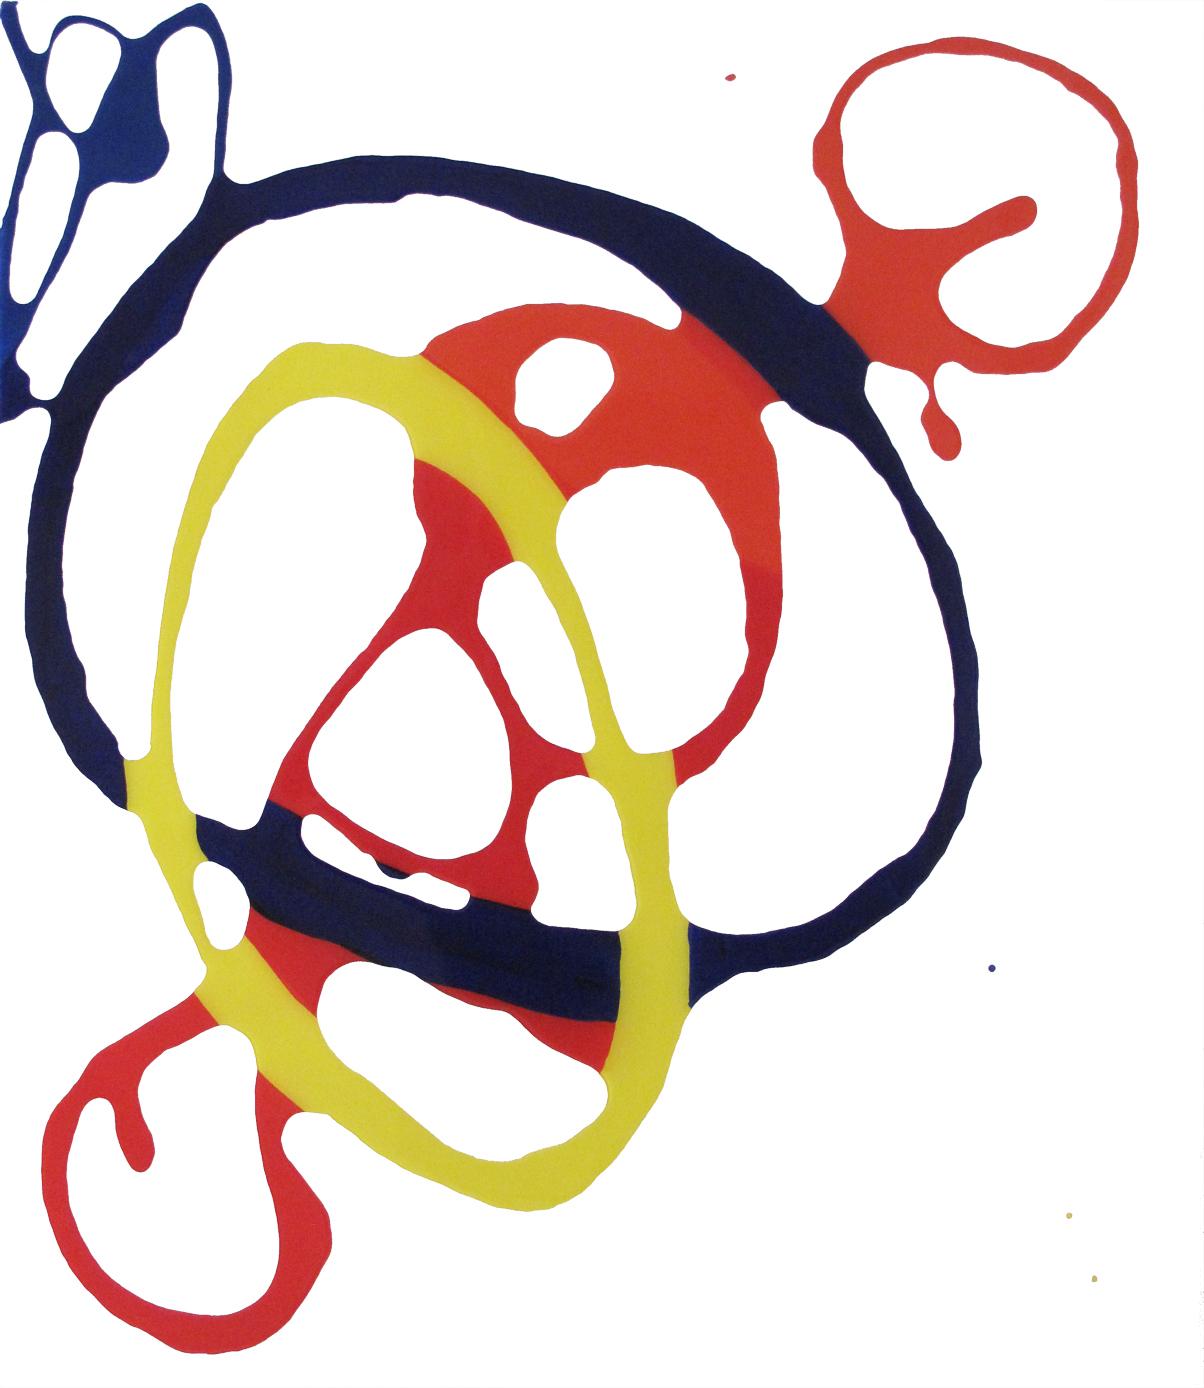 TamaraMendels_Multi Loop Intersect__Art_Pharmacy.jpg